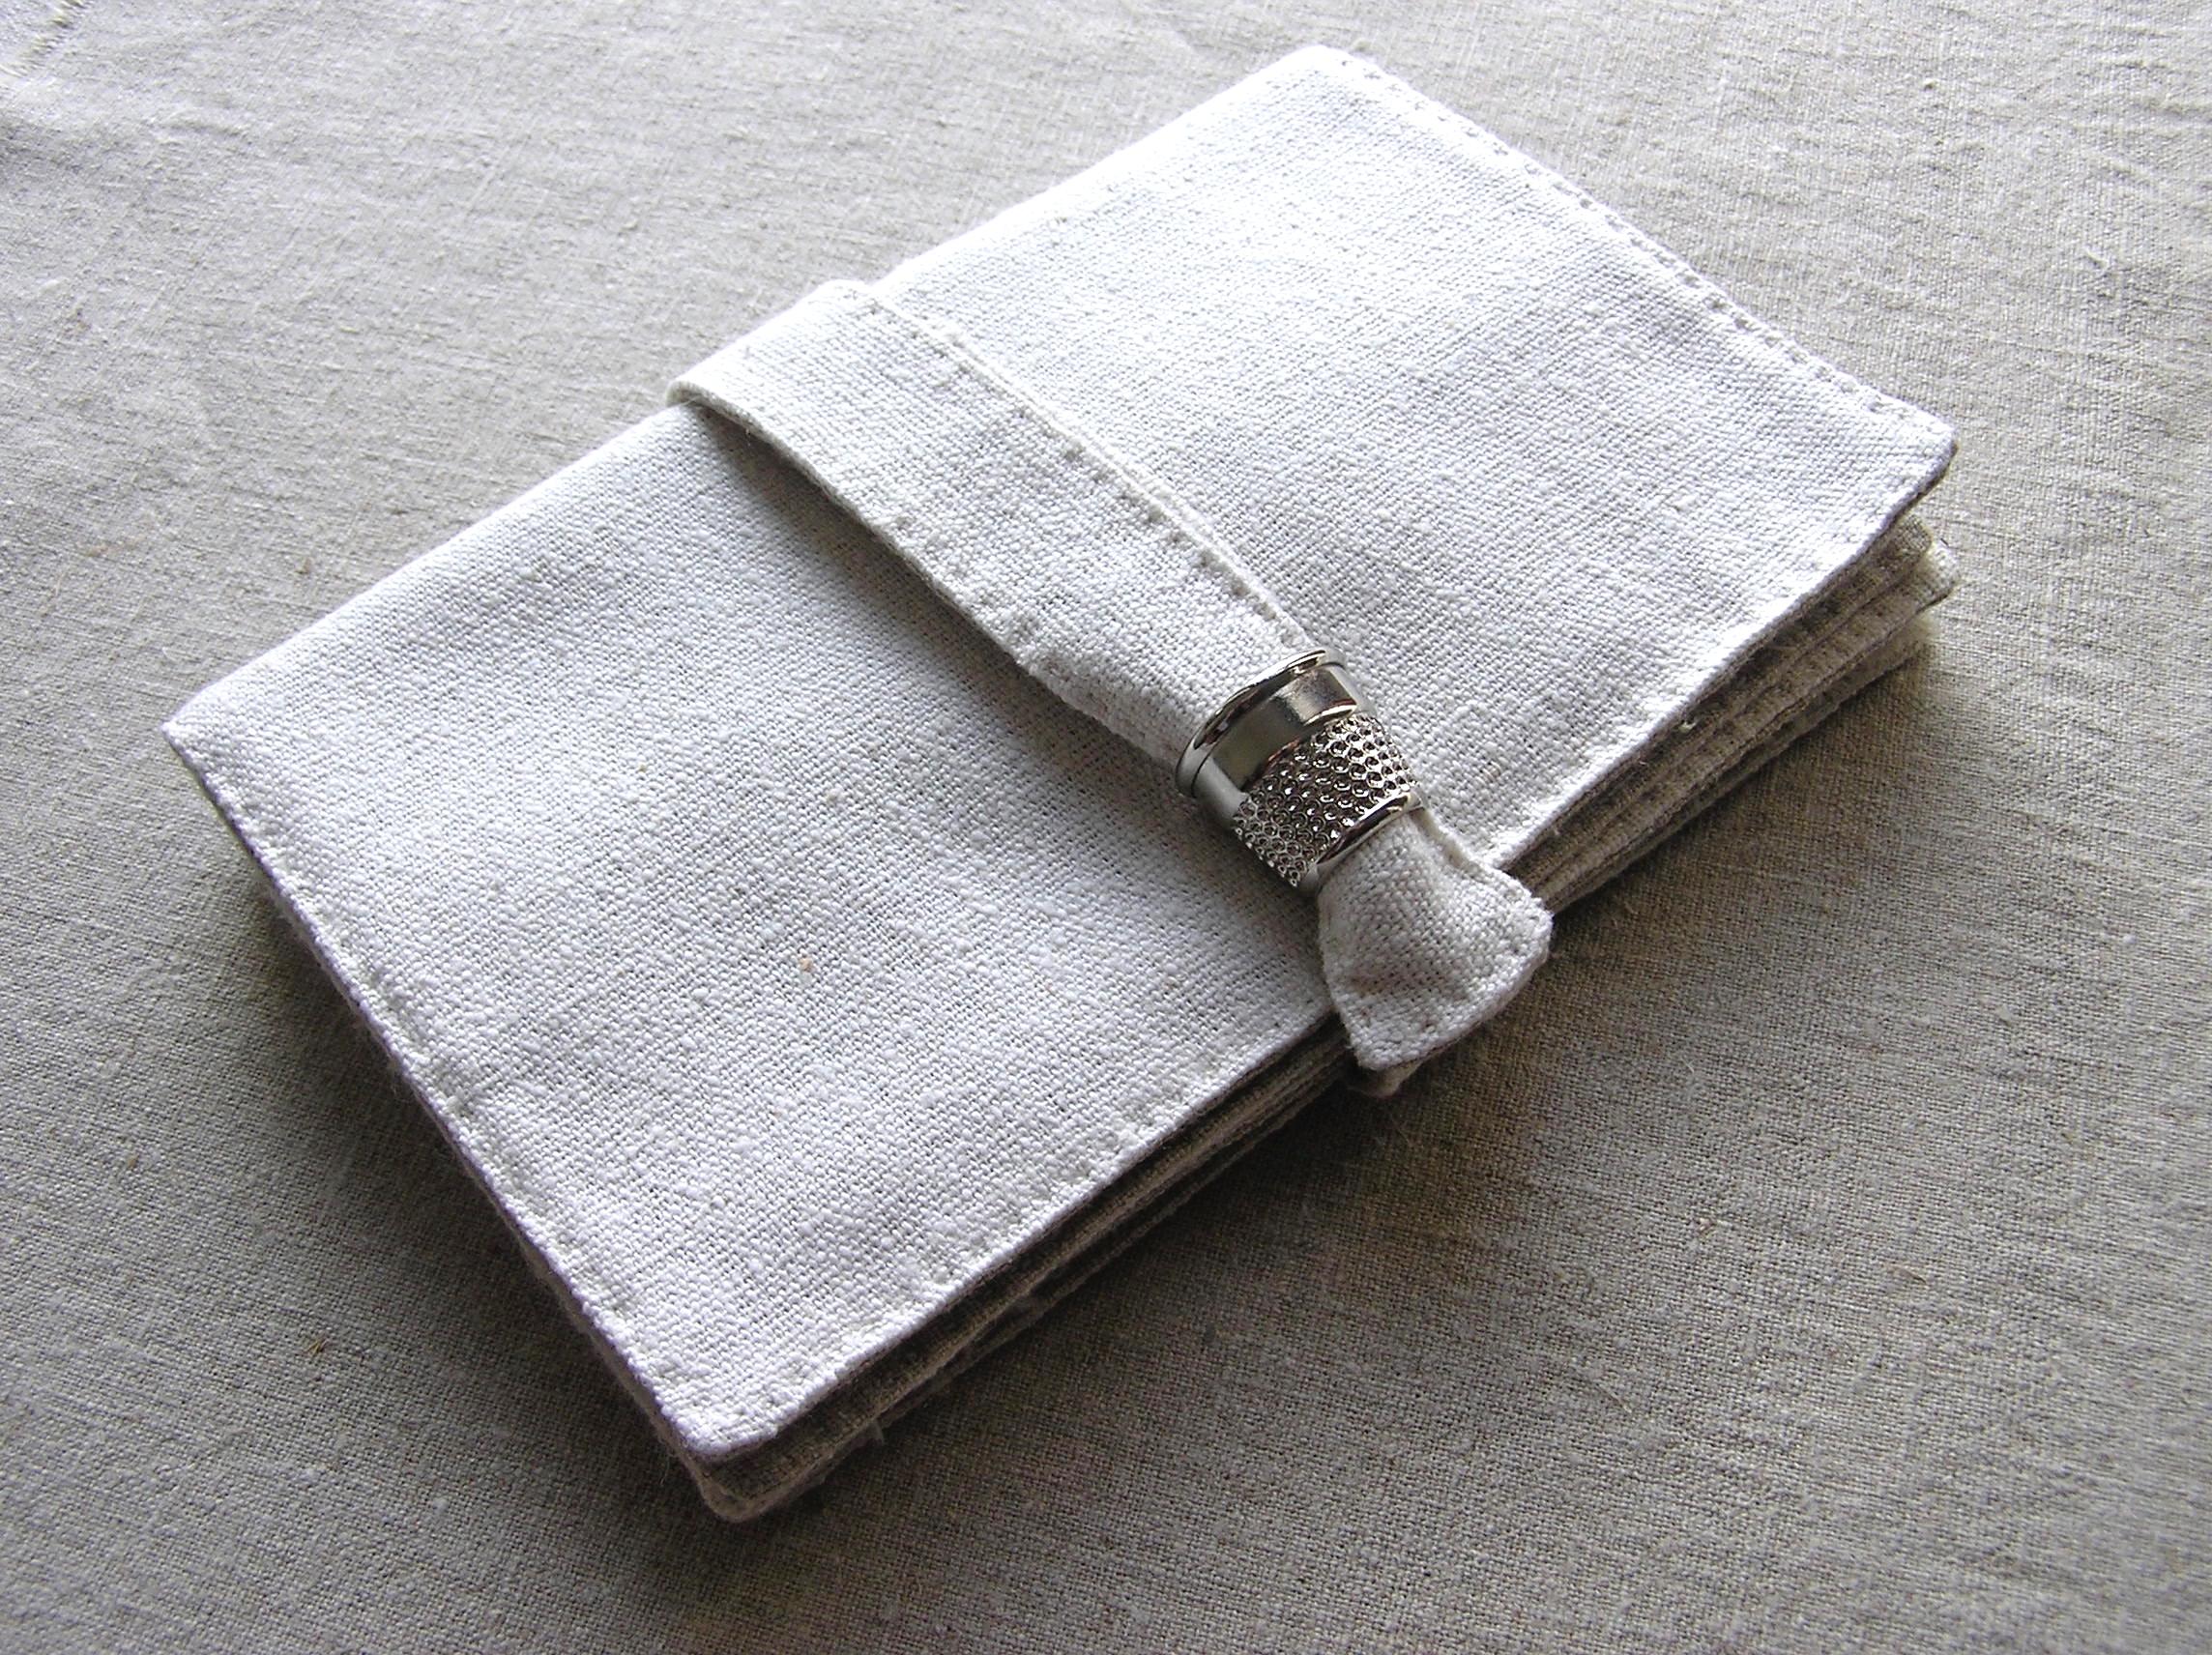 Cloth bound